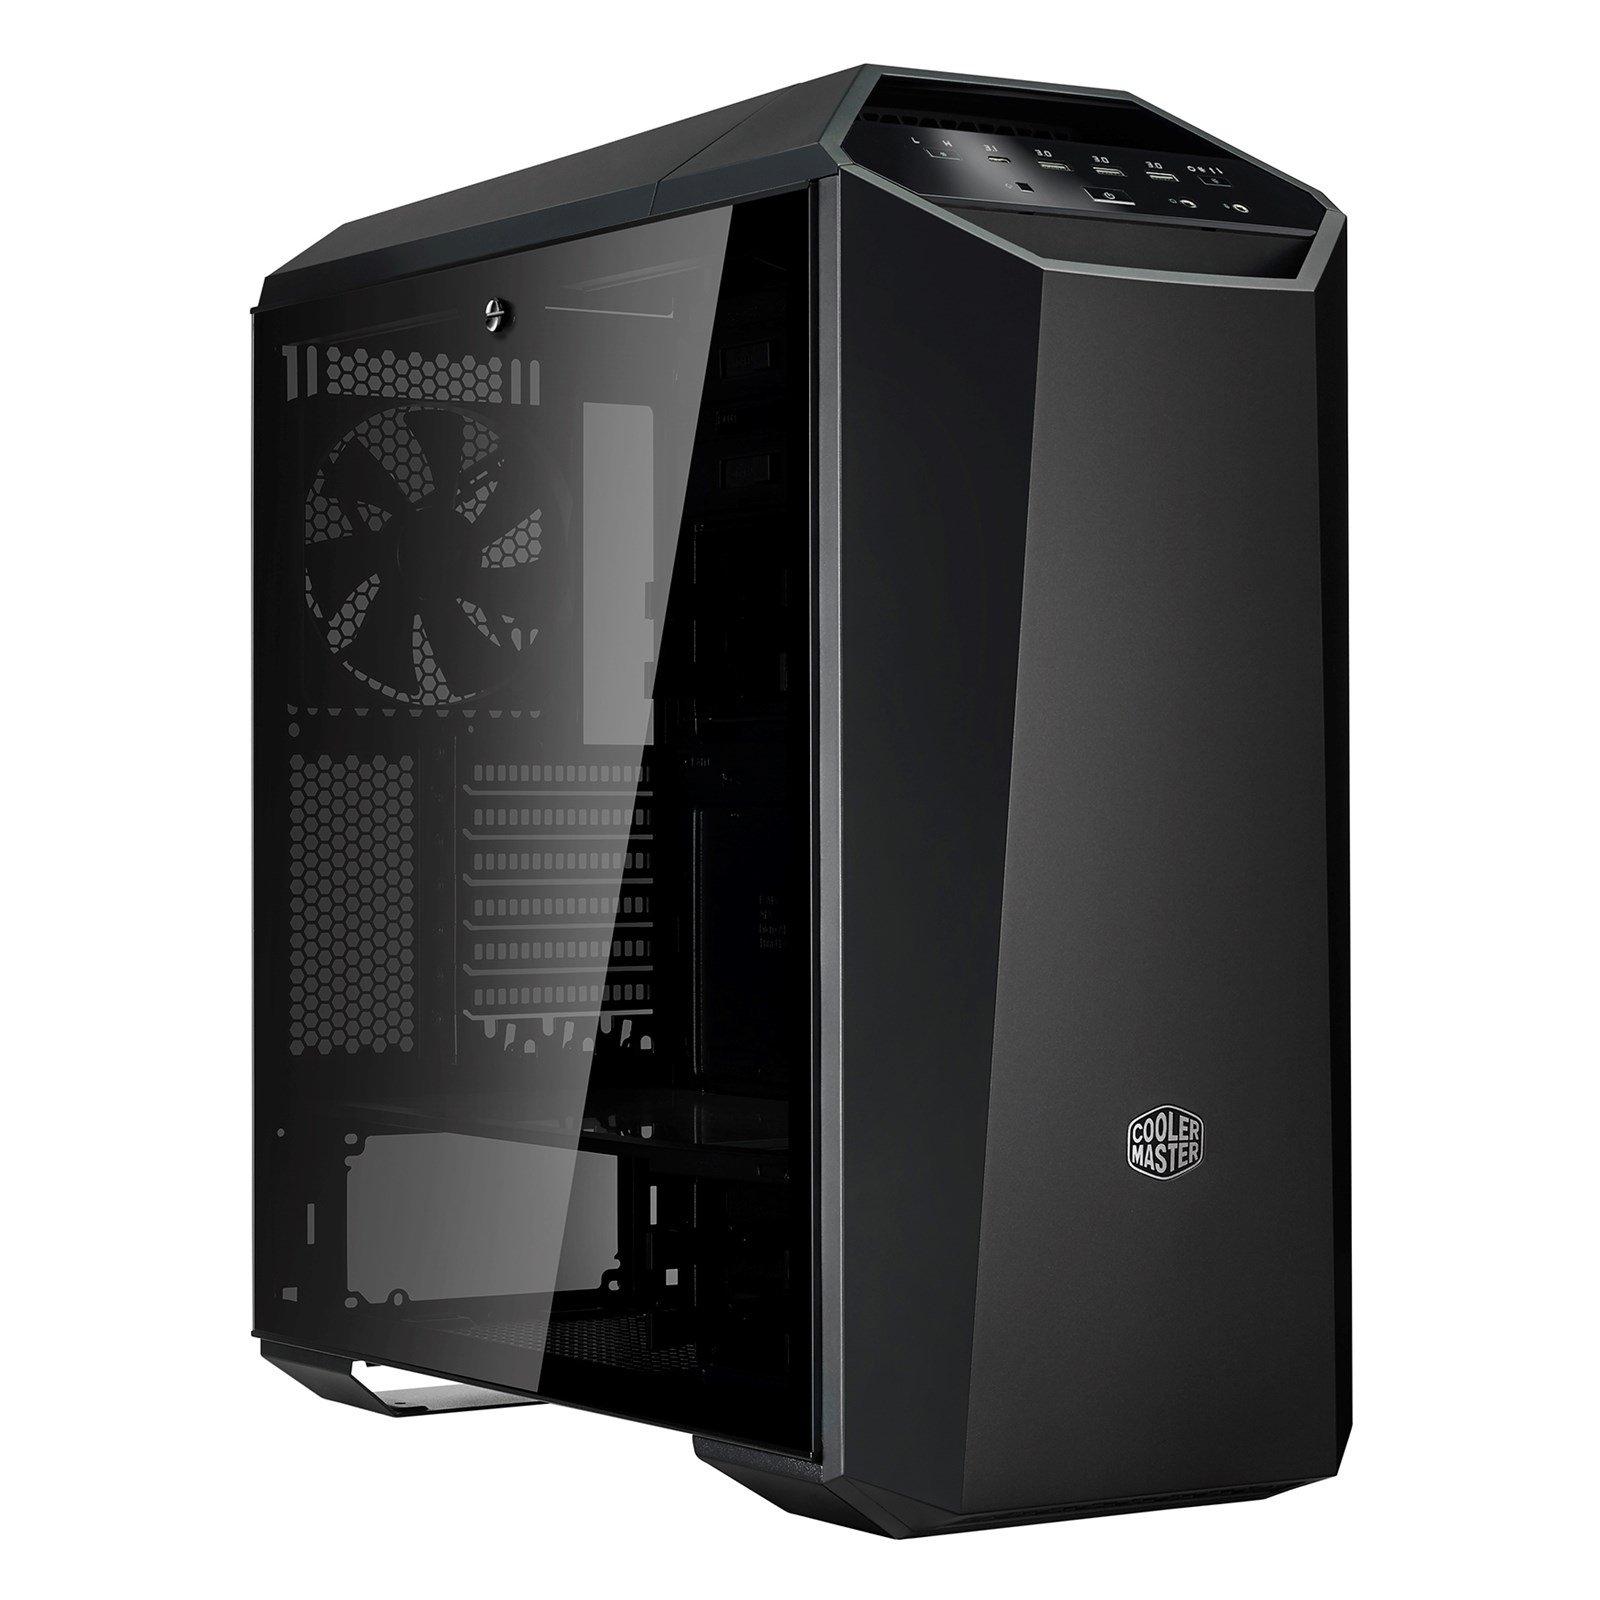 Warlock Gaming PC Ryzen 5 3600, 5700XT, 16gb 3000 DDR4, 1TB SSD £999 + Free Borderland 3. (Optional Ram upgrade to 3200 for £18) @ CCL